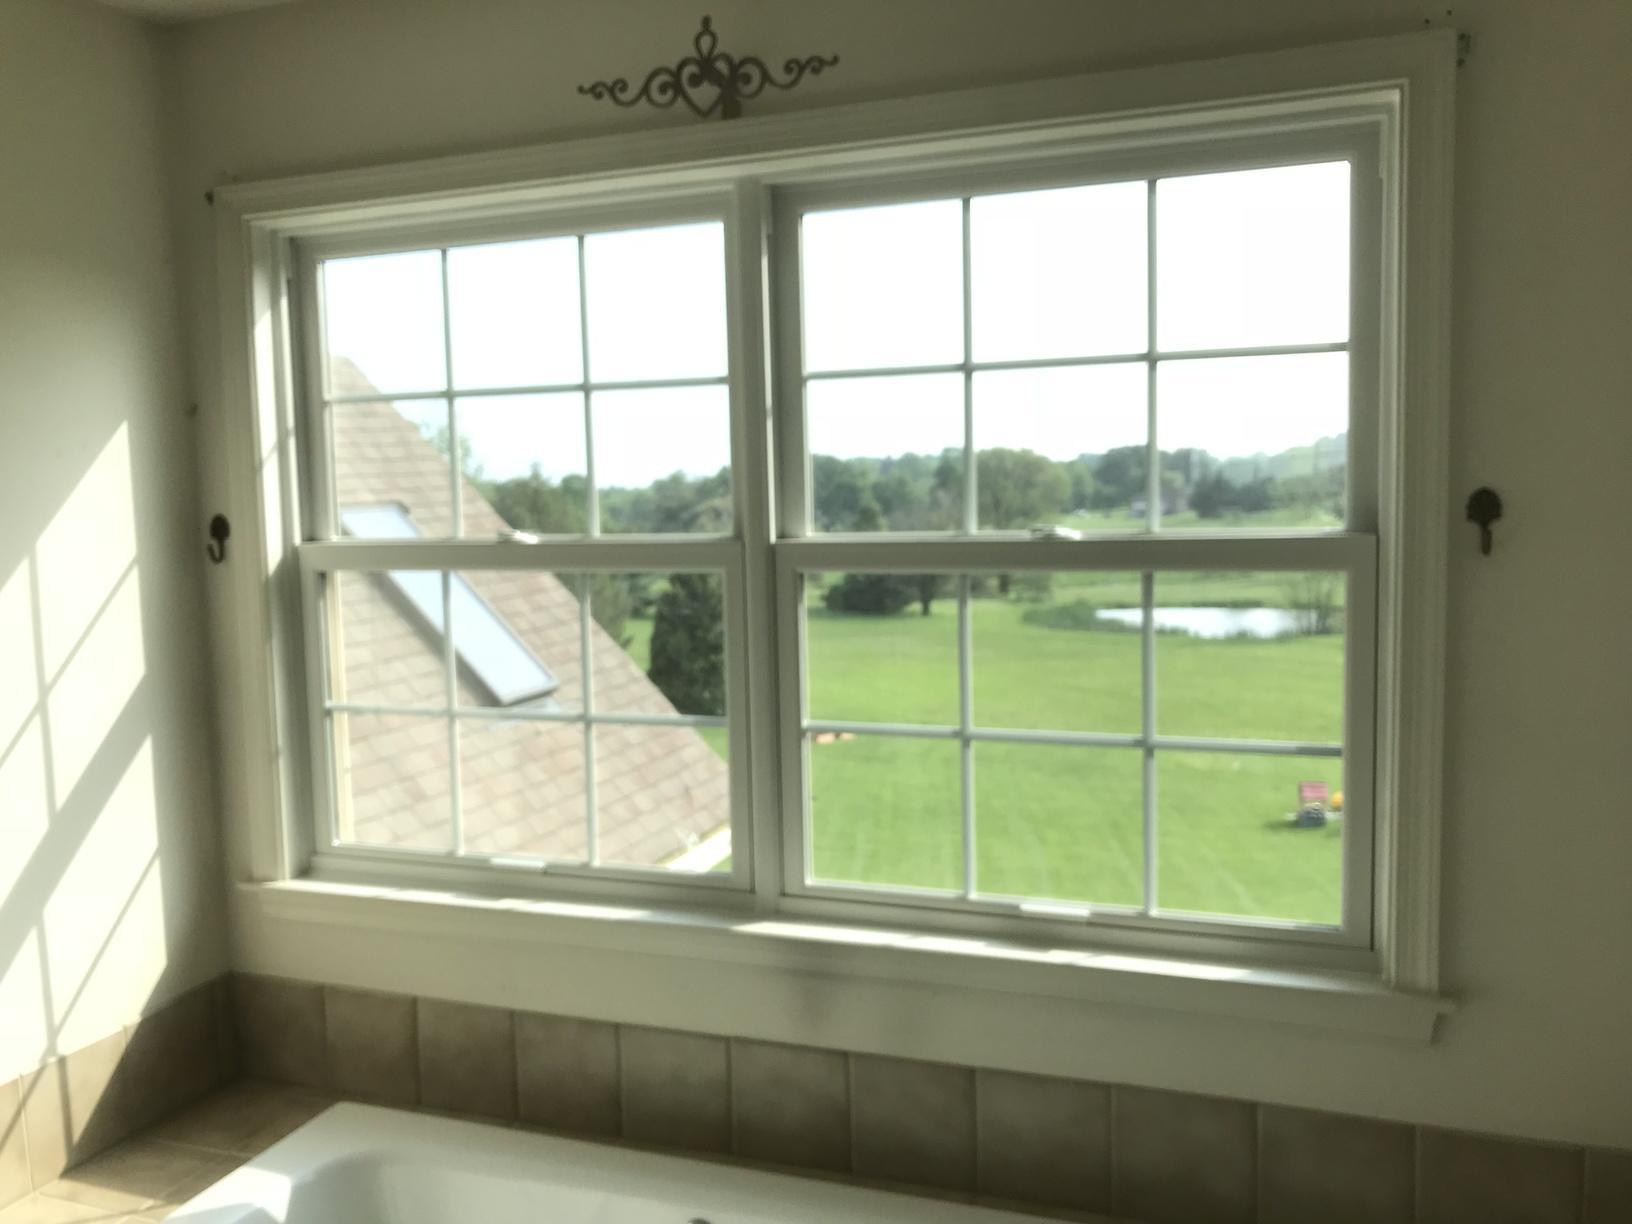 Installing Marvin Windows in Home's Bathroom